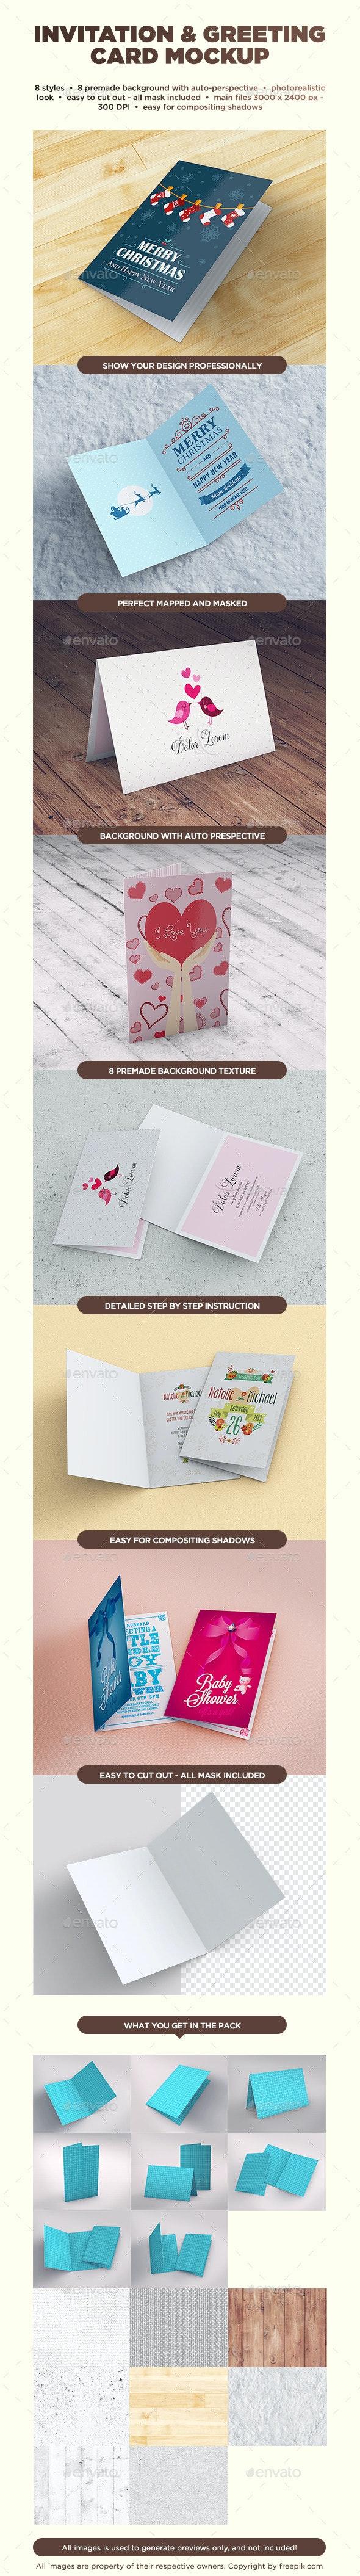 Invitation & Greeting Card Mockup - Miscellaneous Print